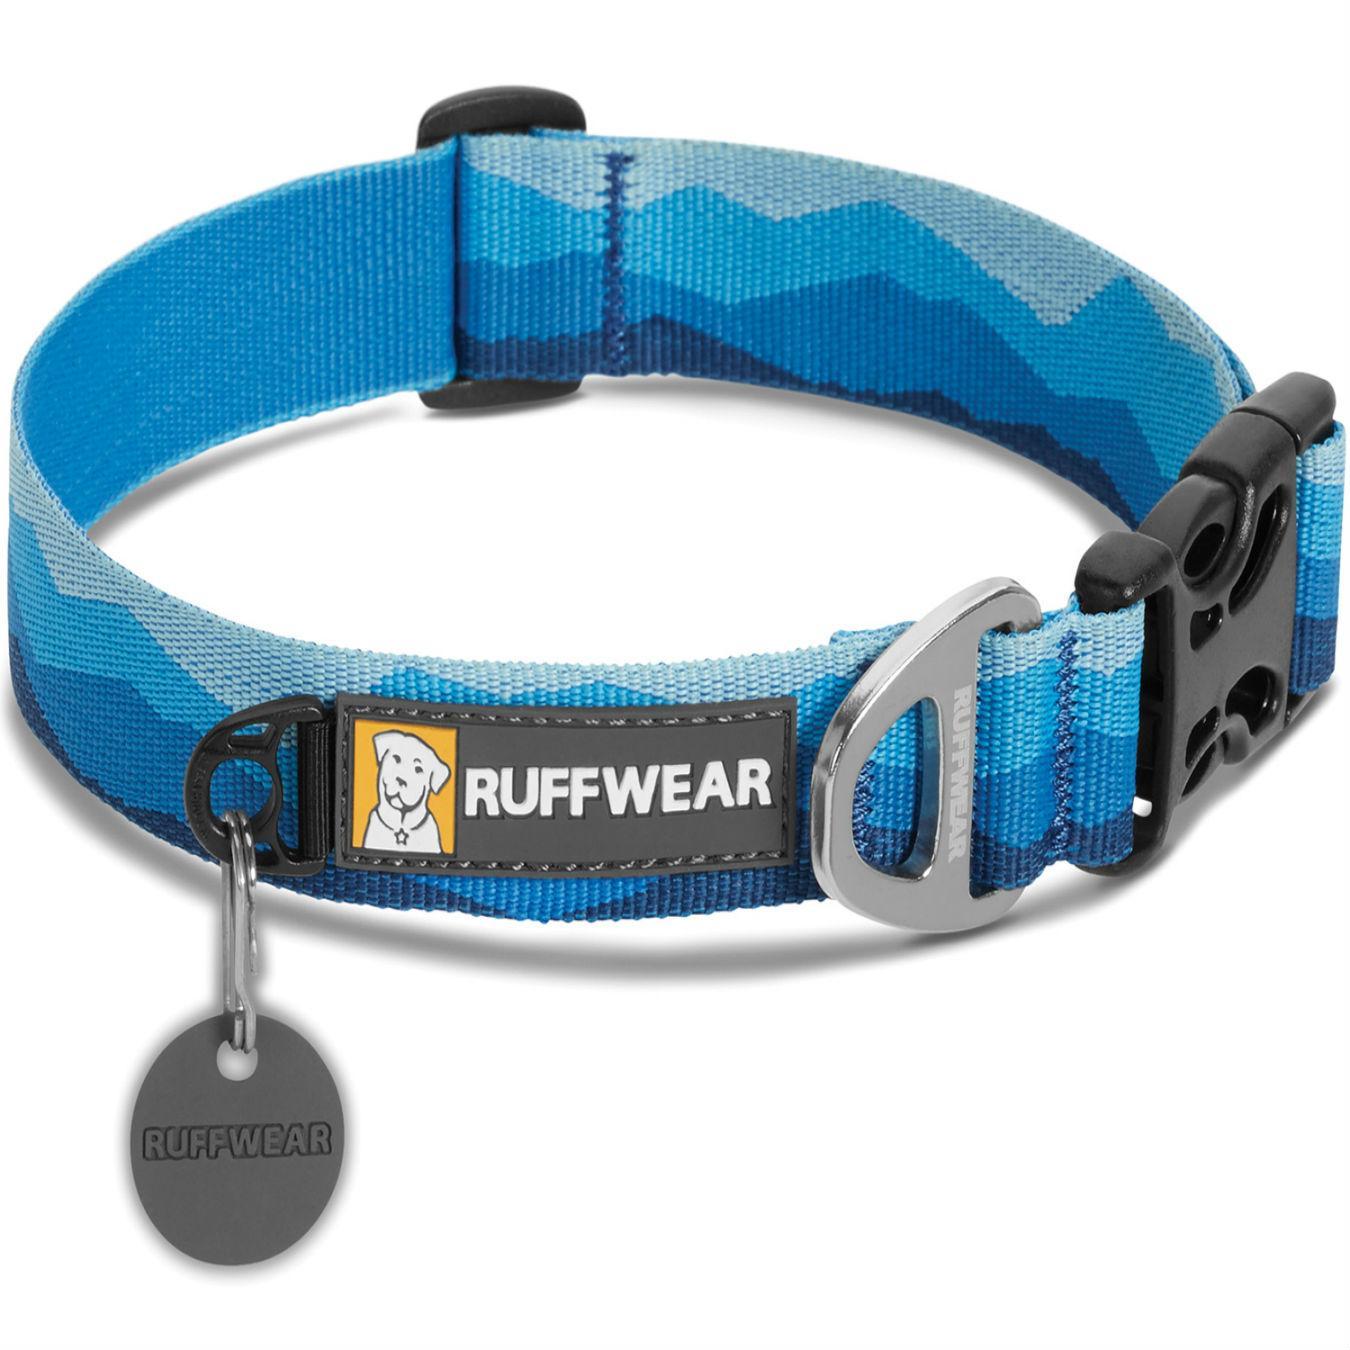 Hoopie Dog Collar by RuffWear - Blue Mountains